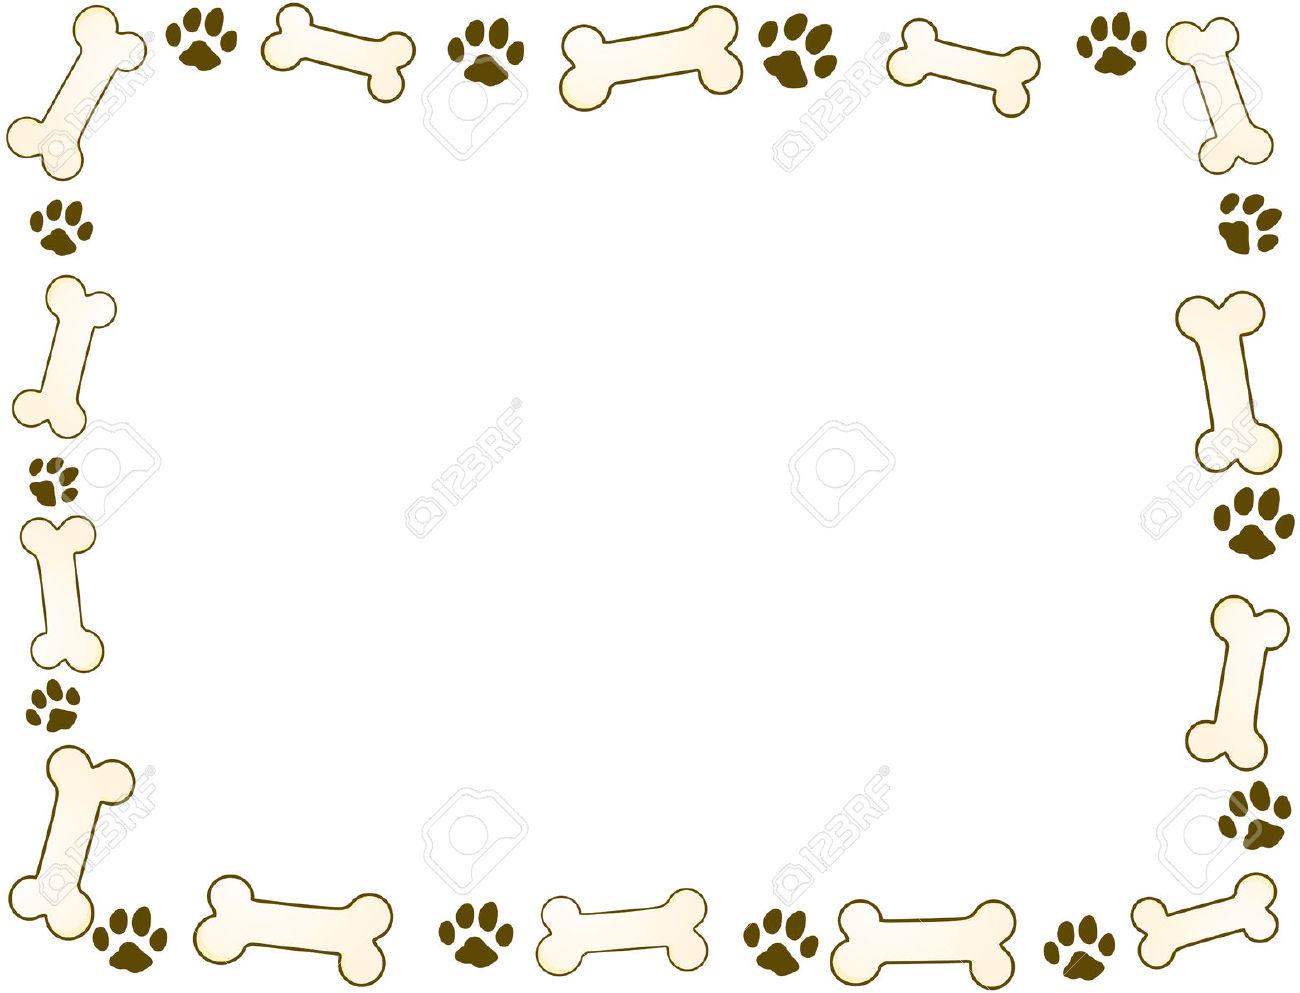 Bone clipart border. Dog frames